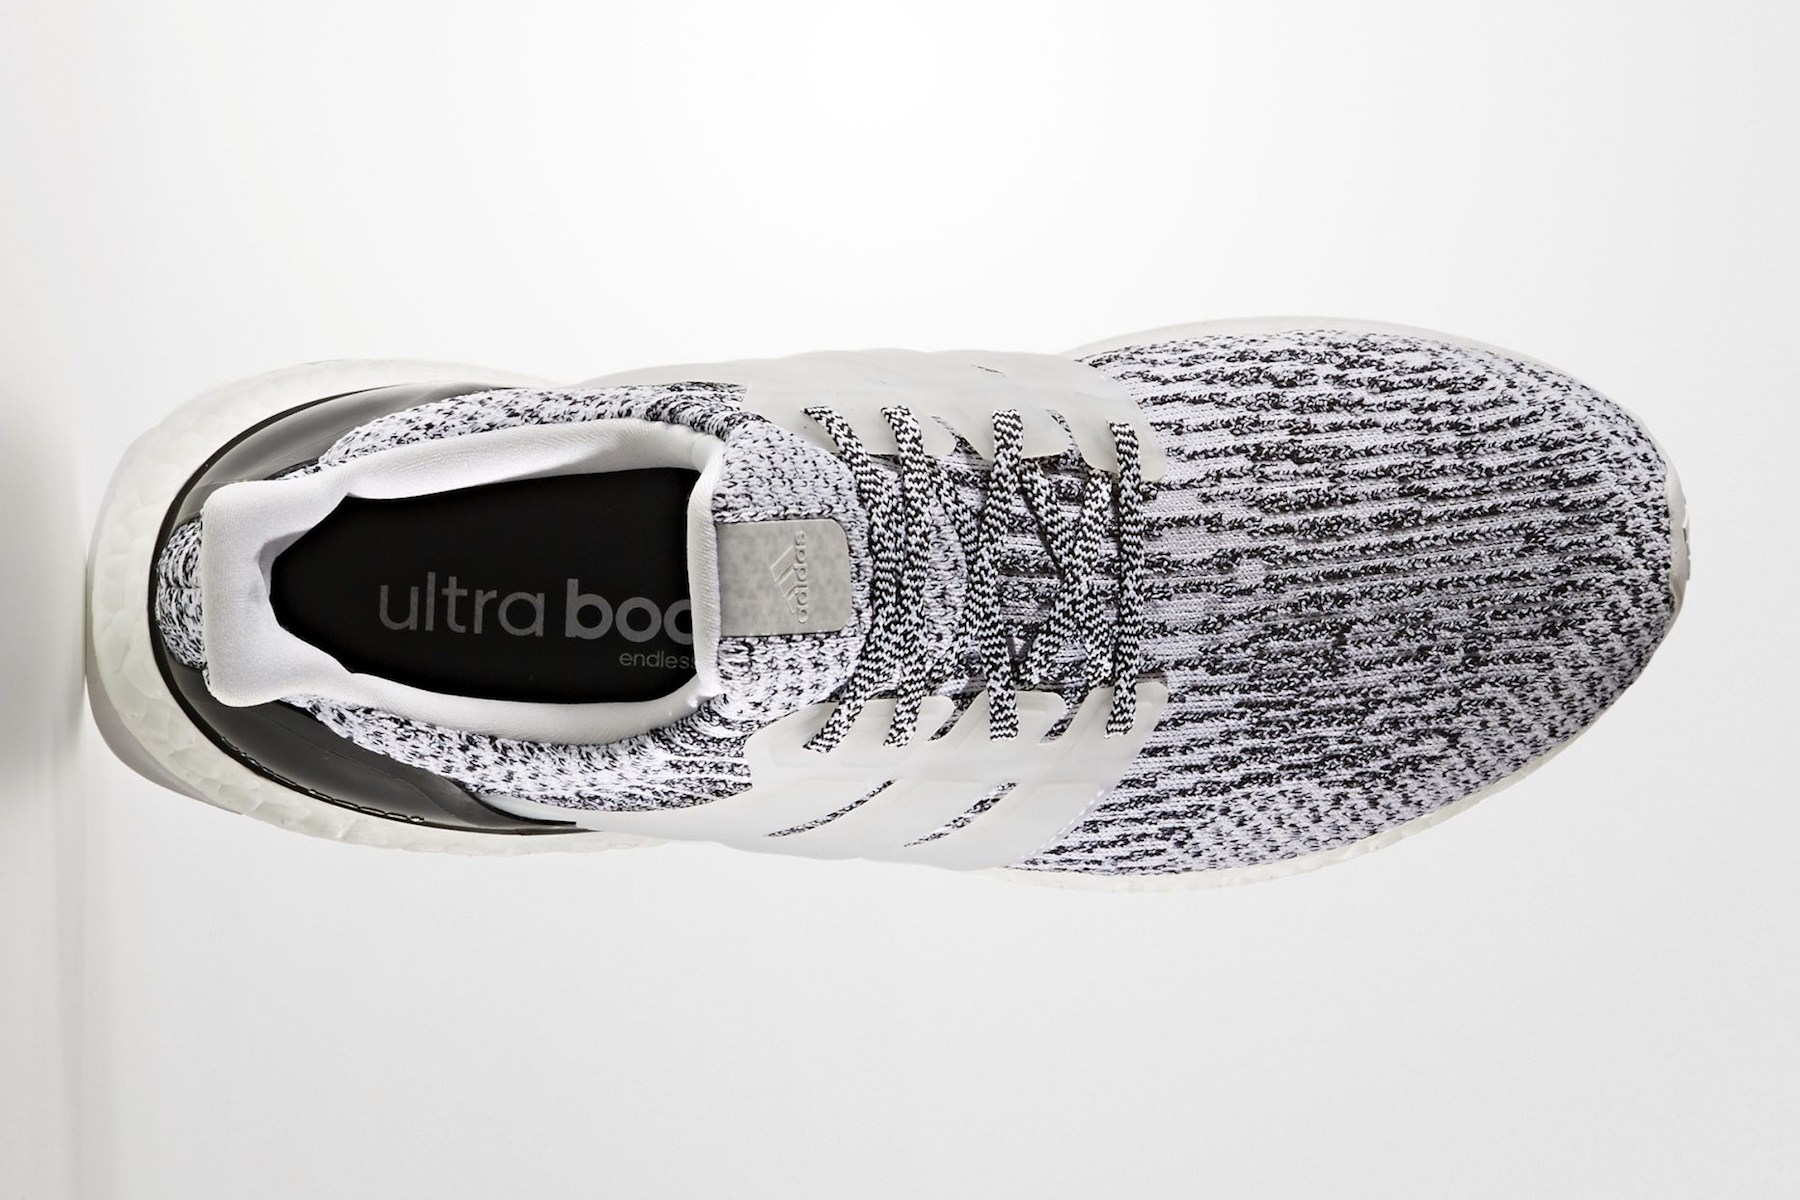 "adidas UltraBOOST 3.0 ""Oreo"" Colorway Three Stripes Germany Cookies BOOST midsole - 1819603"